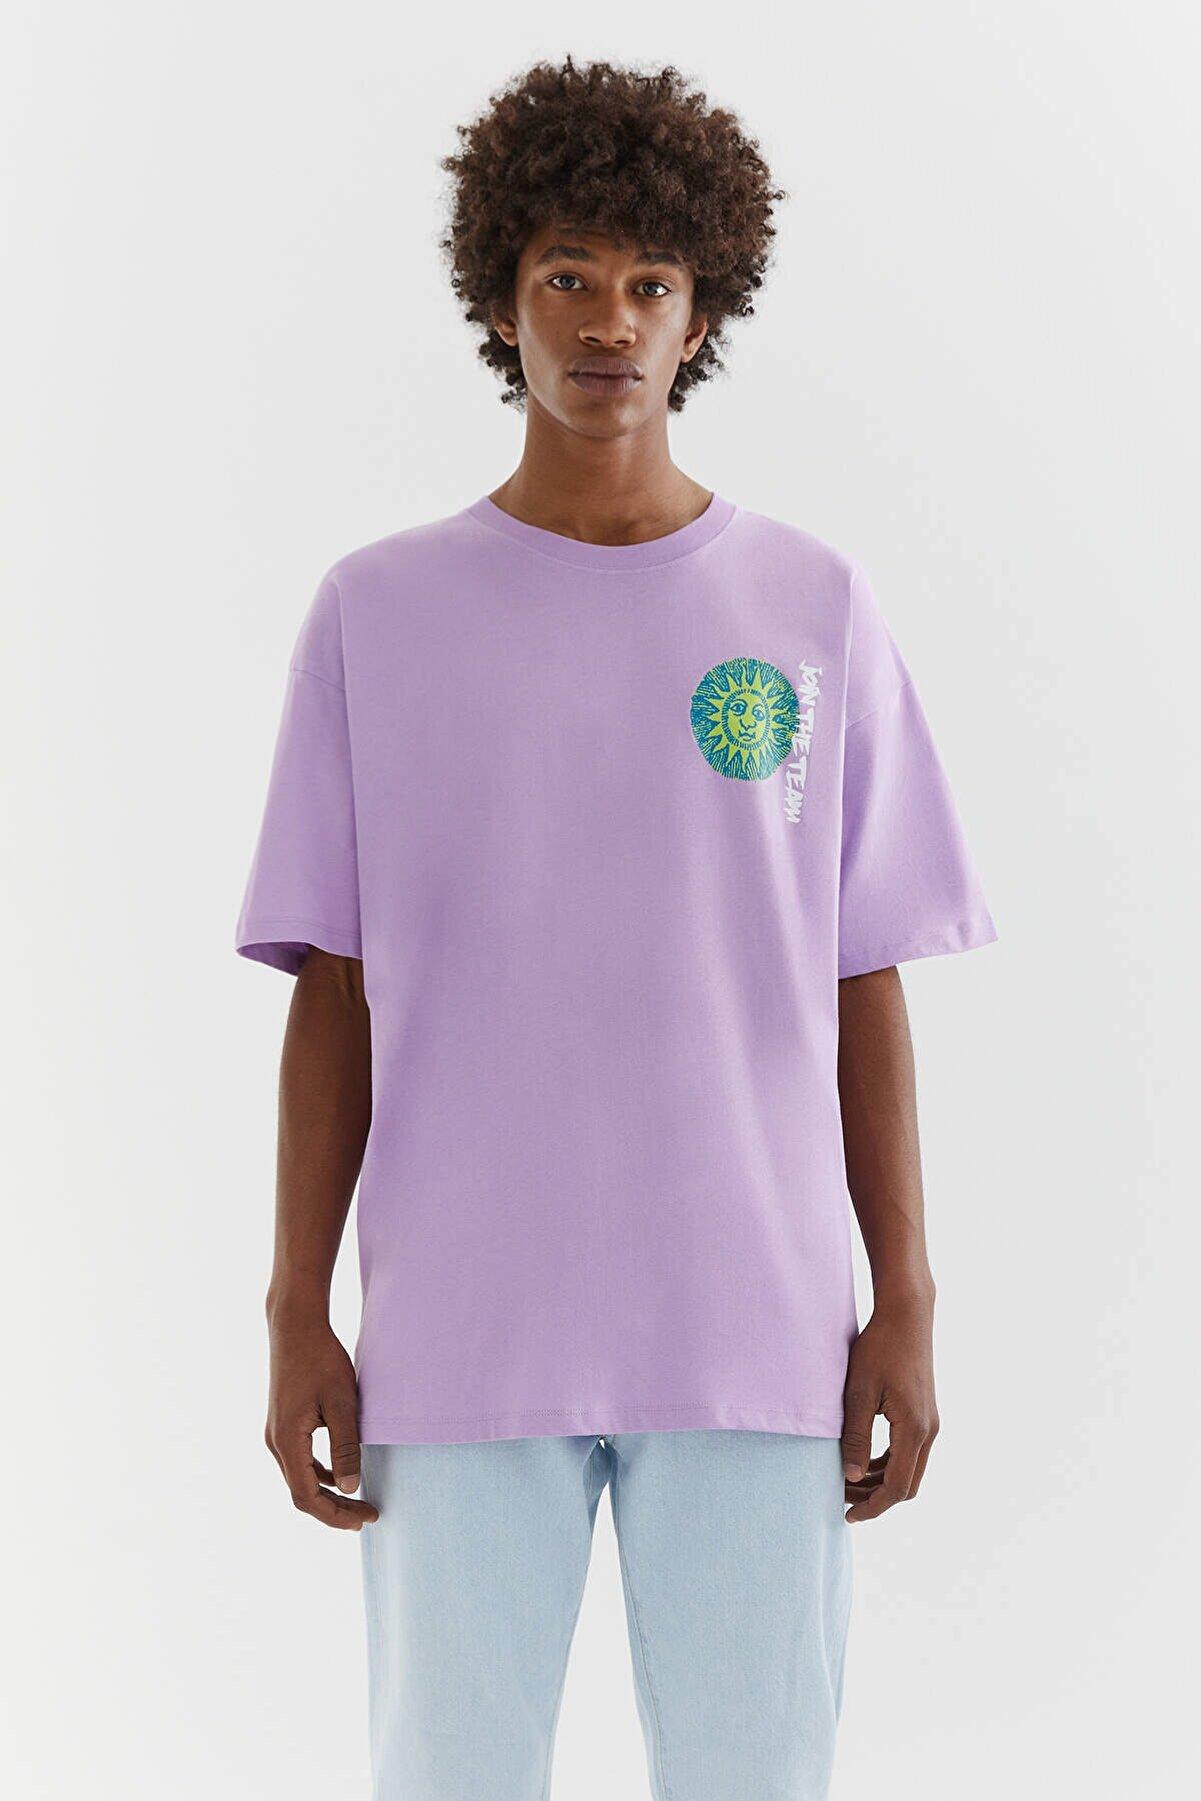 Pull & Bear Maya Görselli Mor T-Shirt